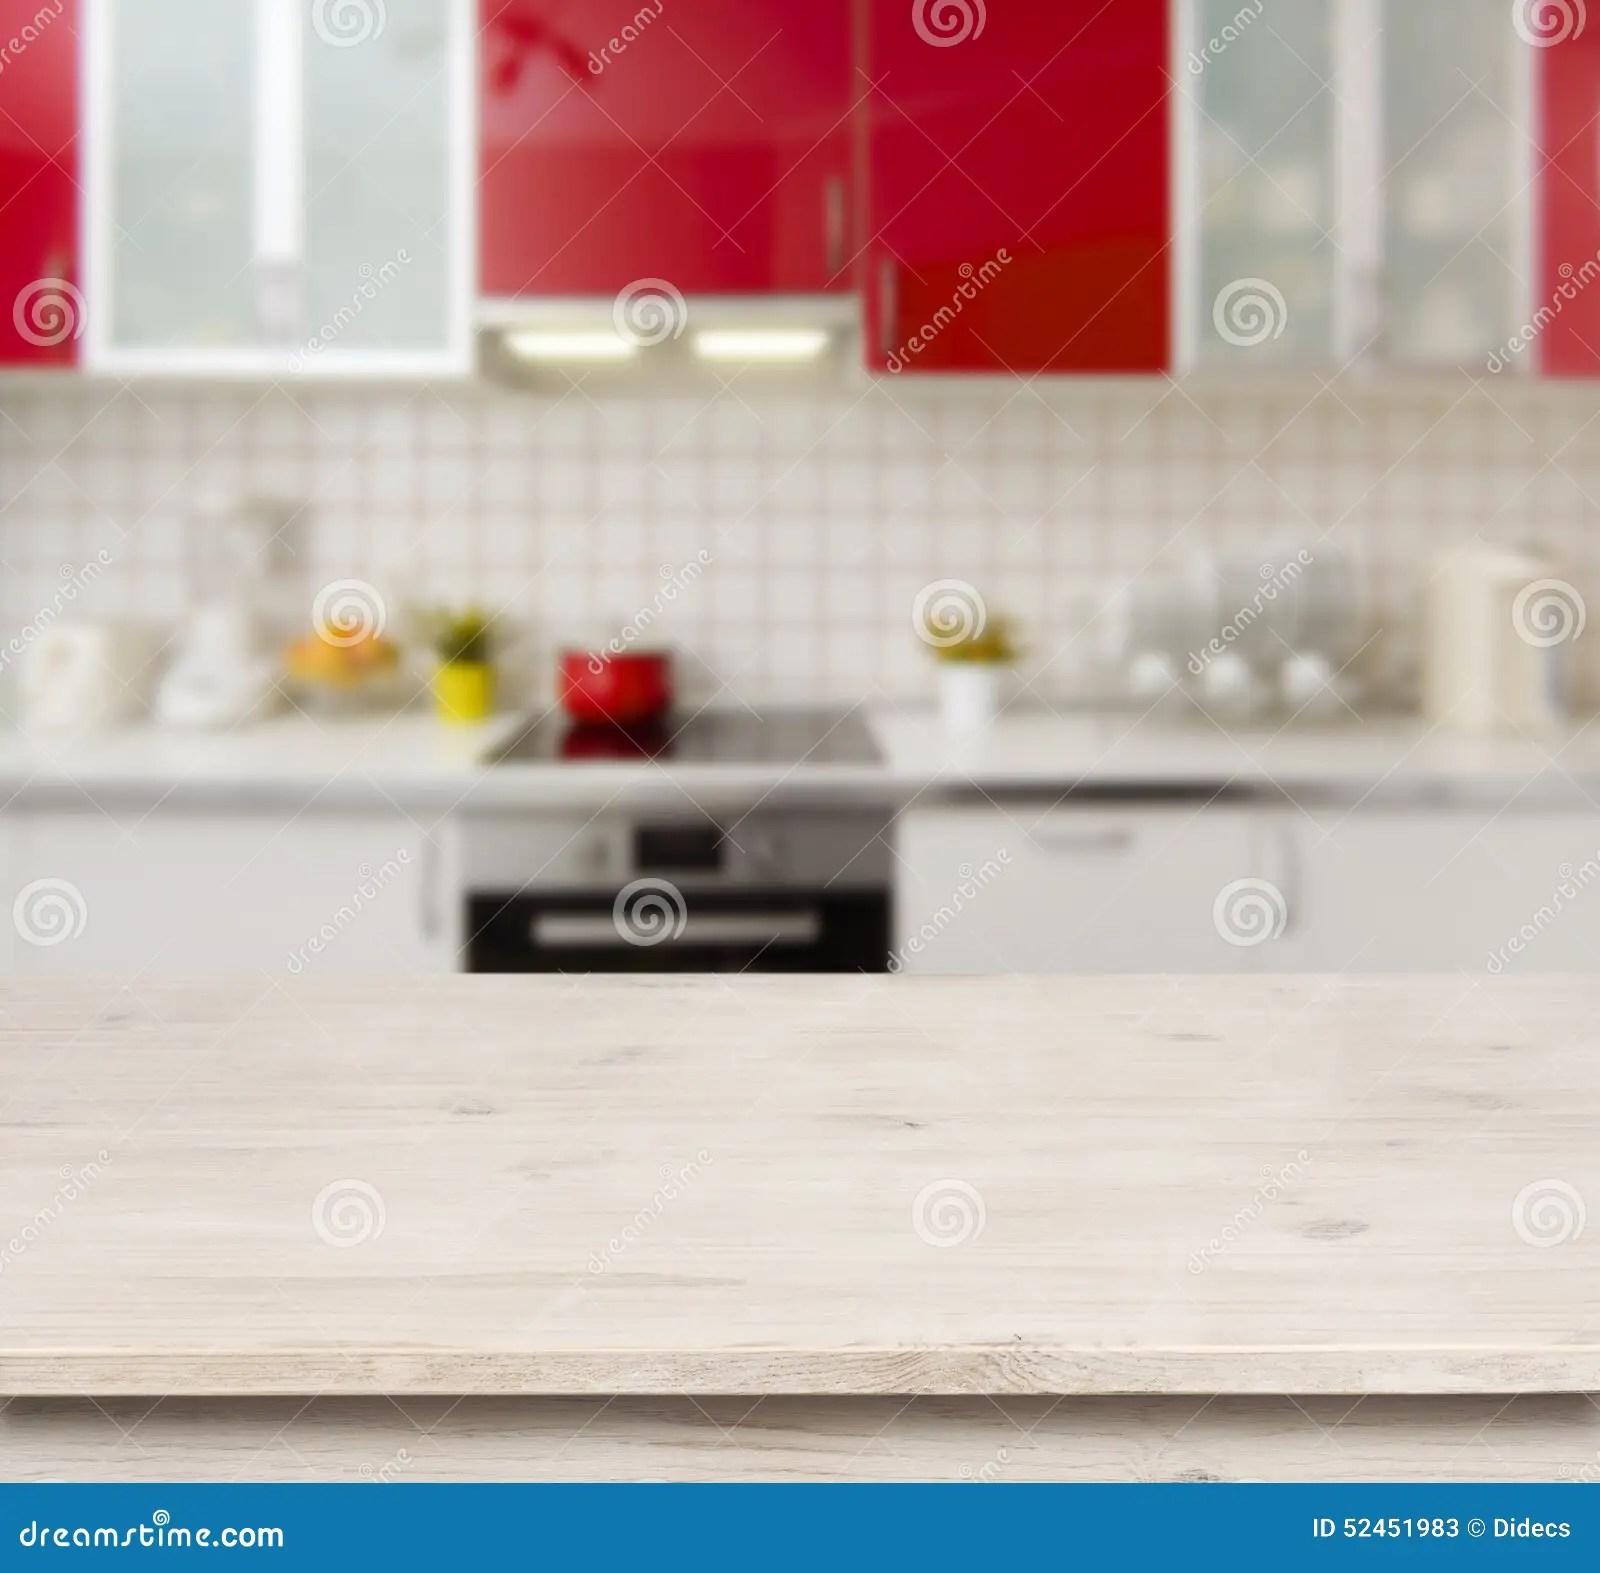 wood table kitchen ikea backsplash 在红色现代厨房长凳内部背景的木桌库存图片 图片包括有装饰 烤箱 制动 在红色现代厨房长凳内部背景的木桌